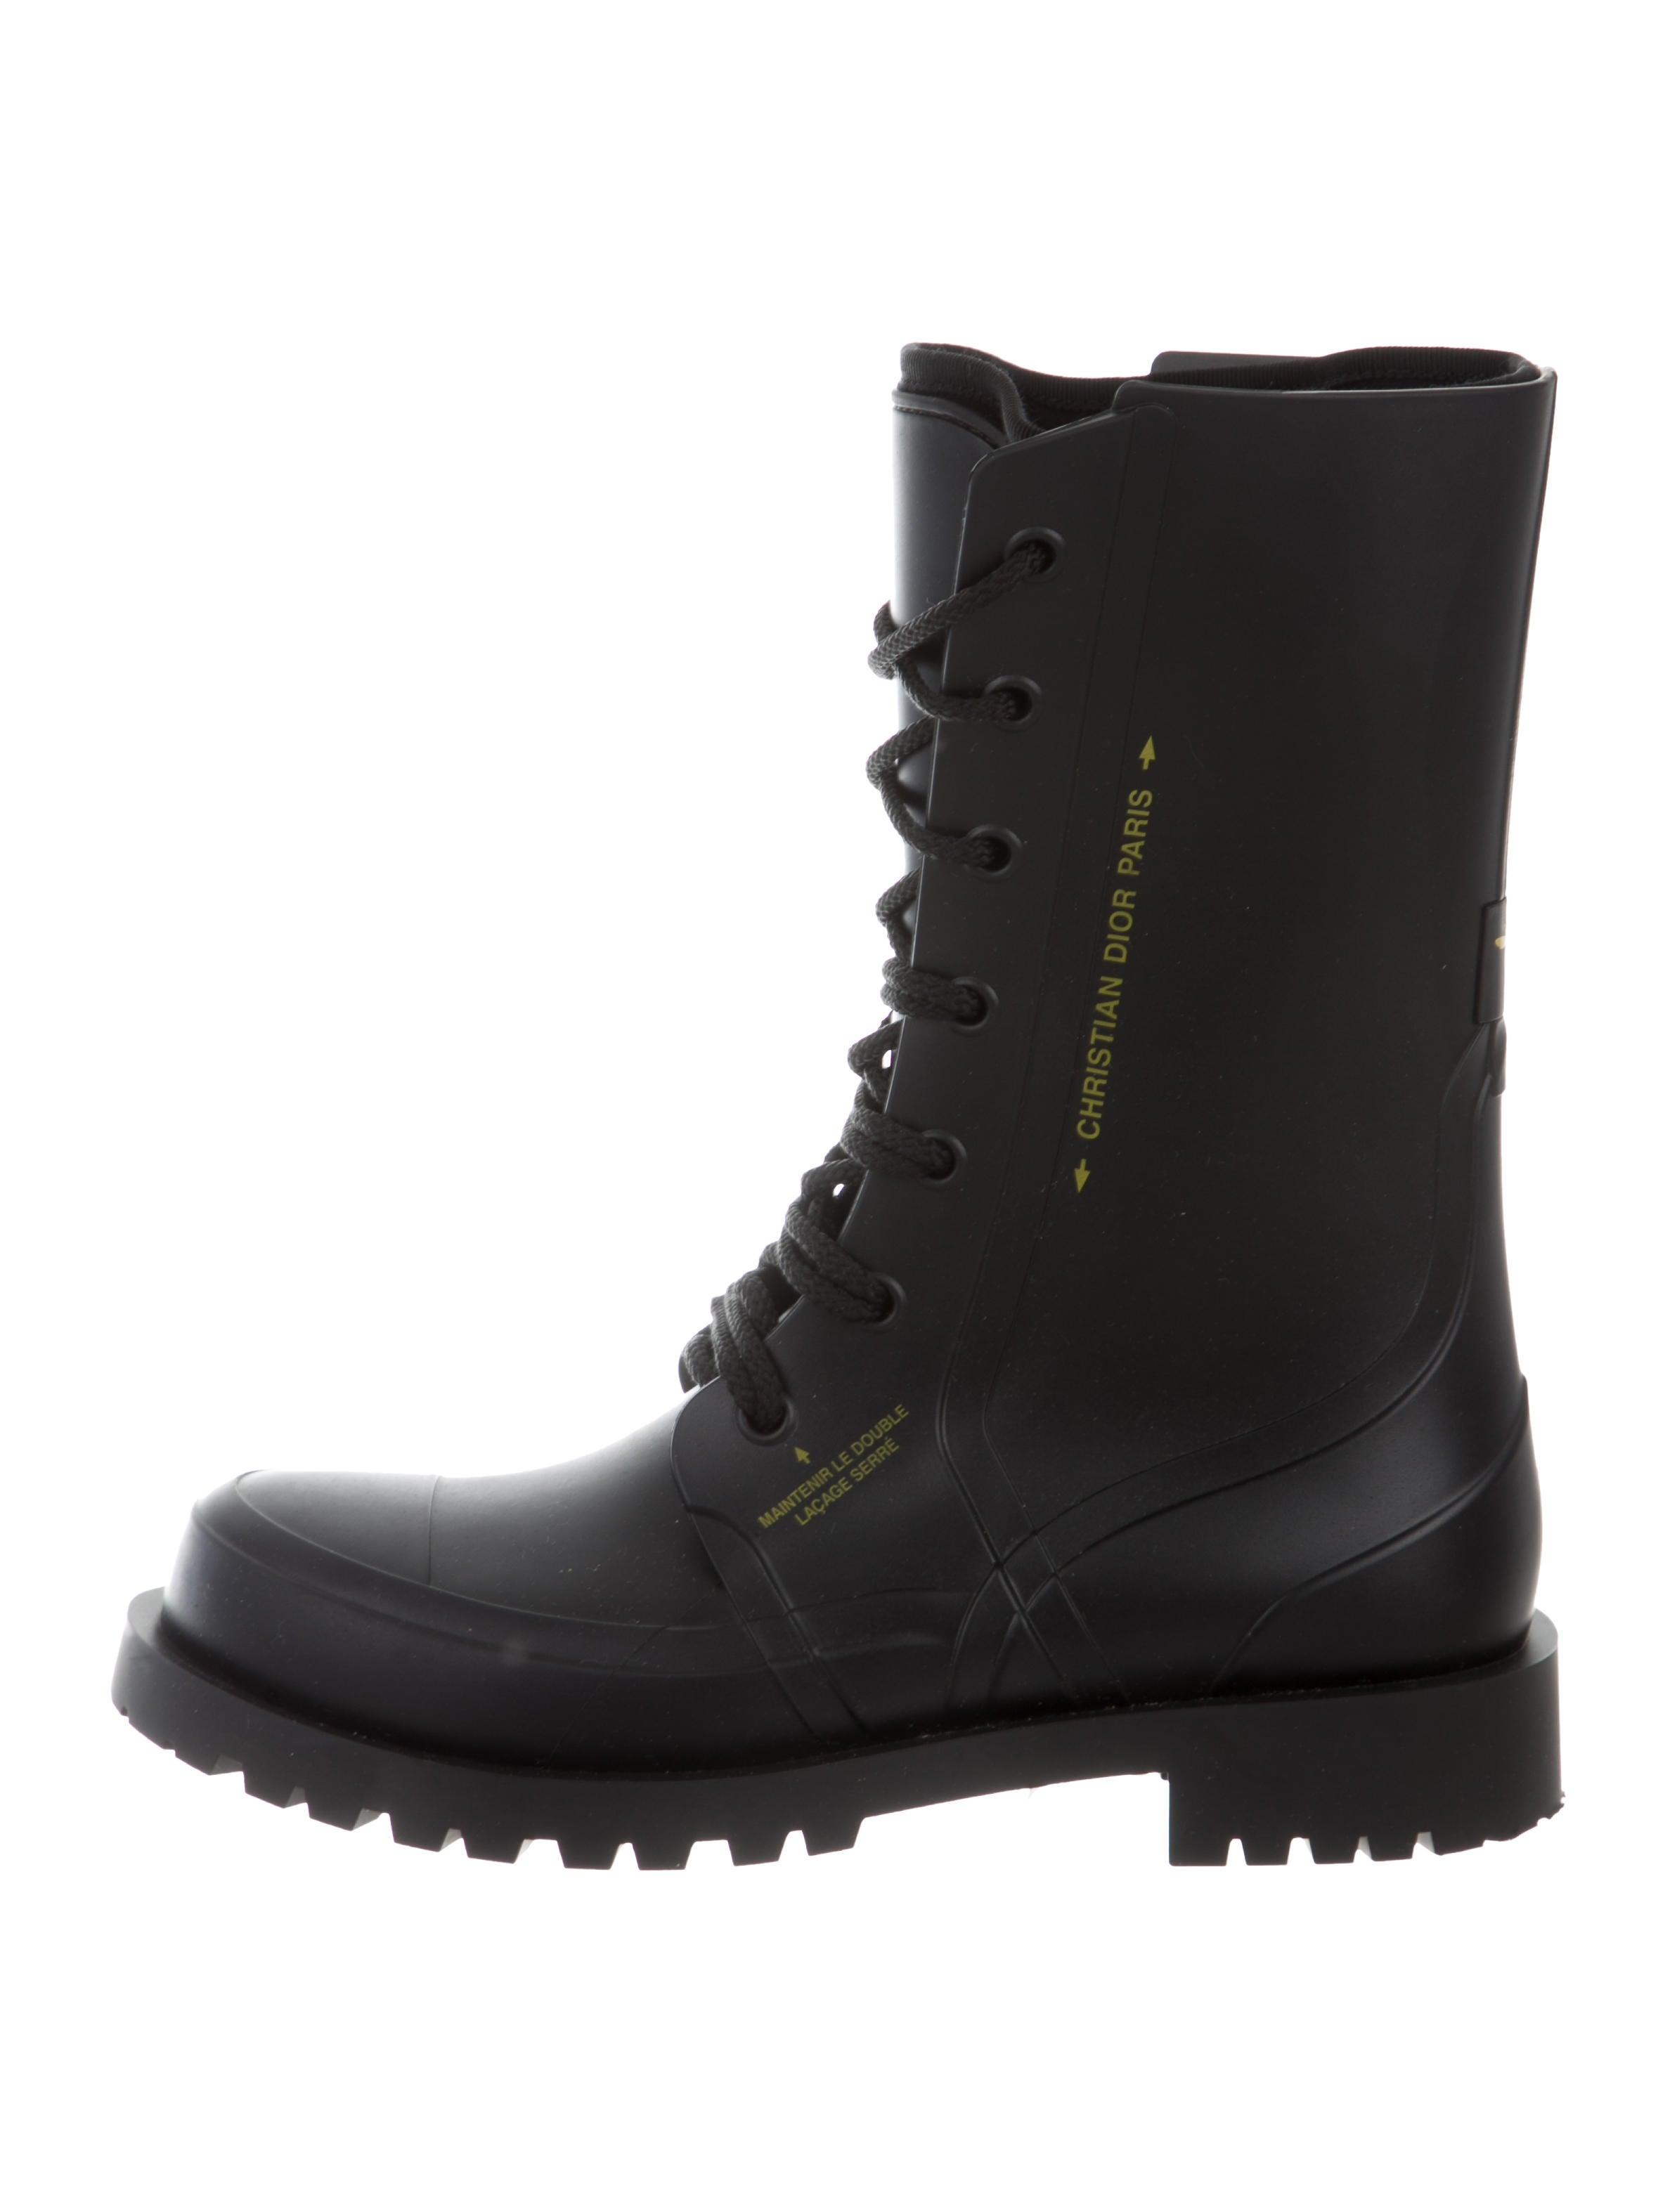 Christian Dior Diorcamp Rubber Boots